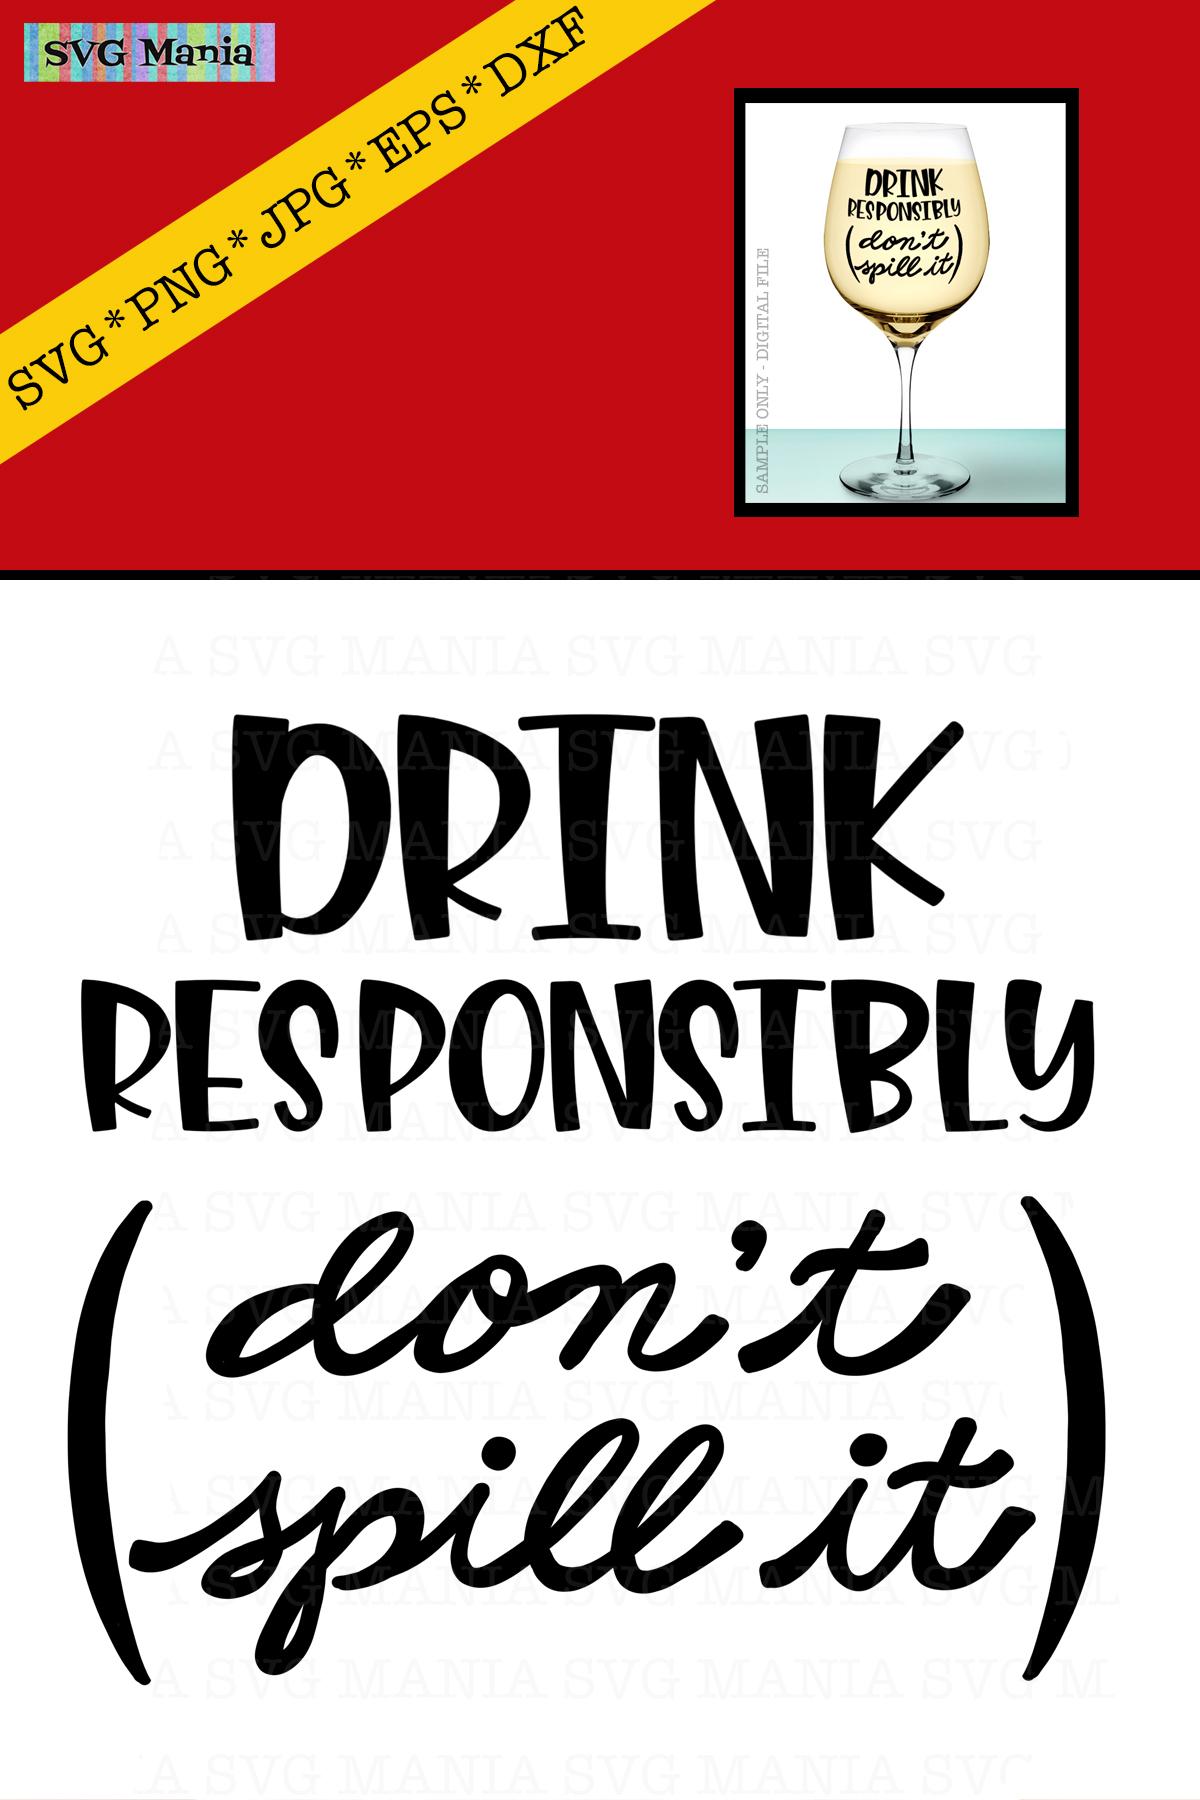 Funny Wine Glass SVG File, Wine Glass Saying SVG, Wine SVG example image 2